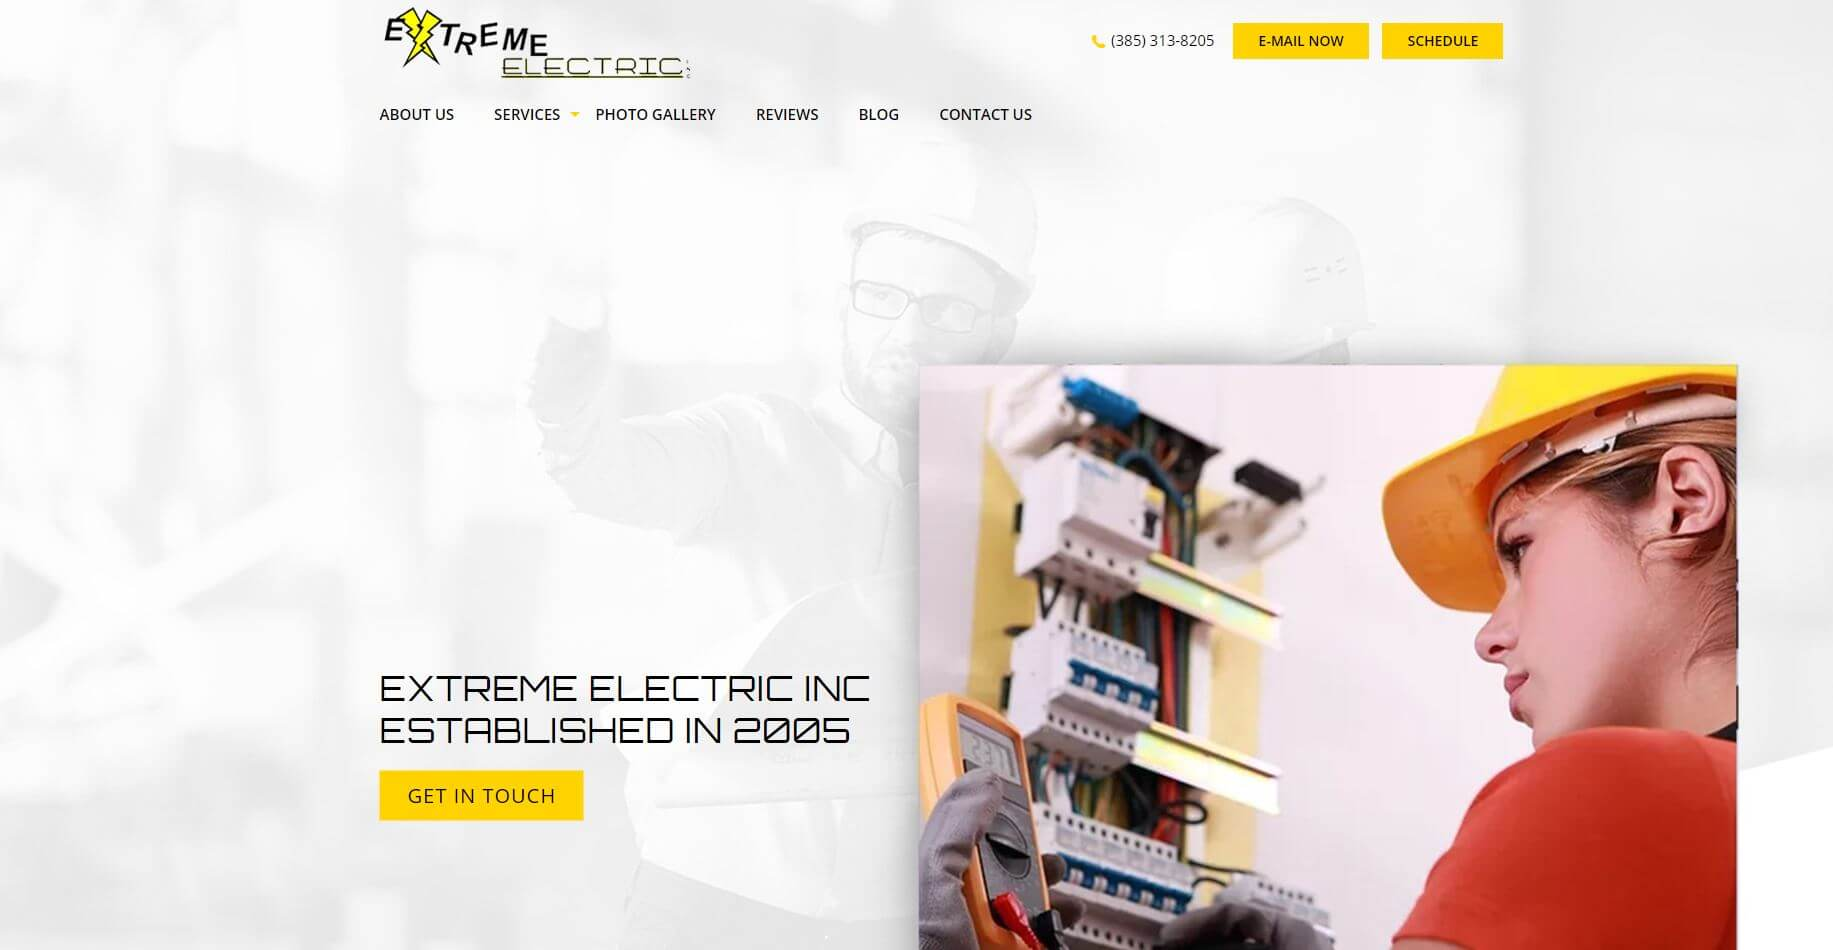 extreme electric electrician salt lake city